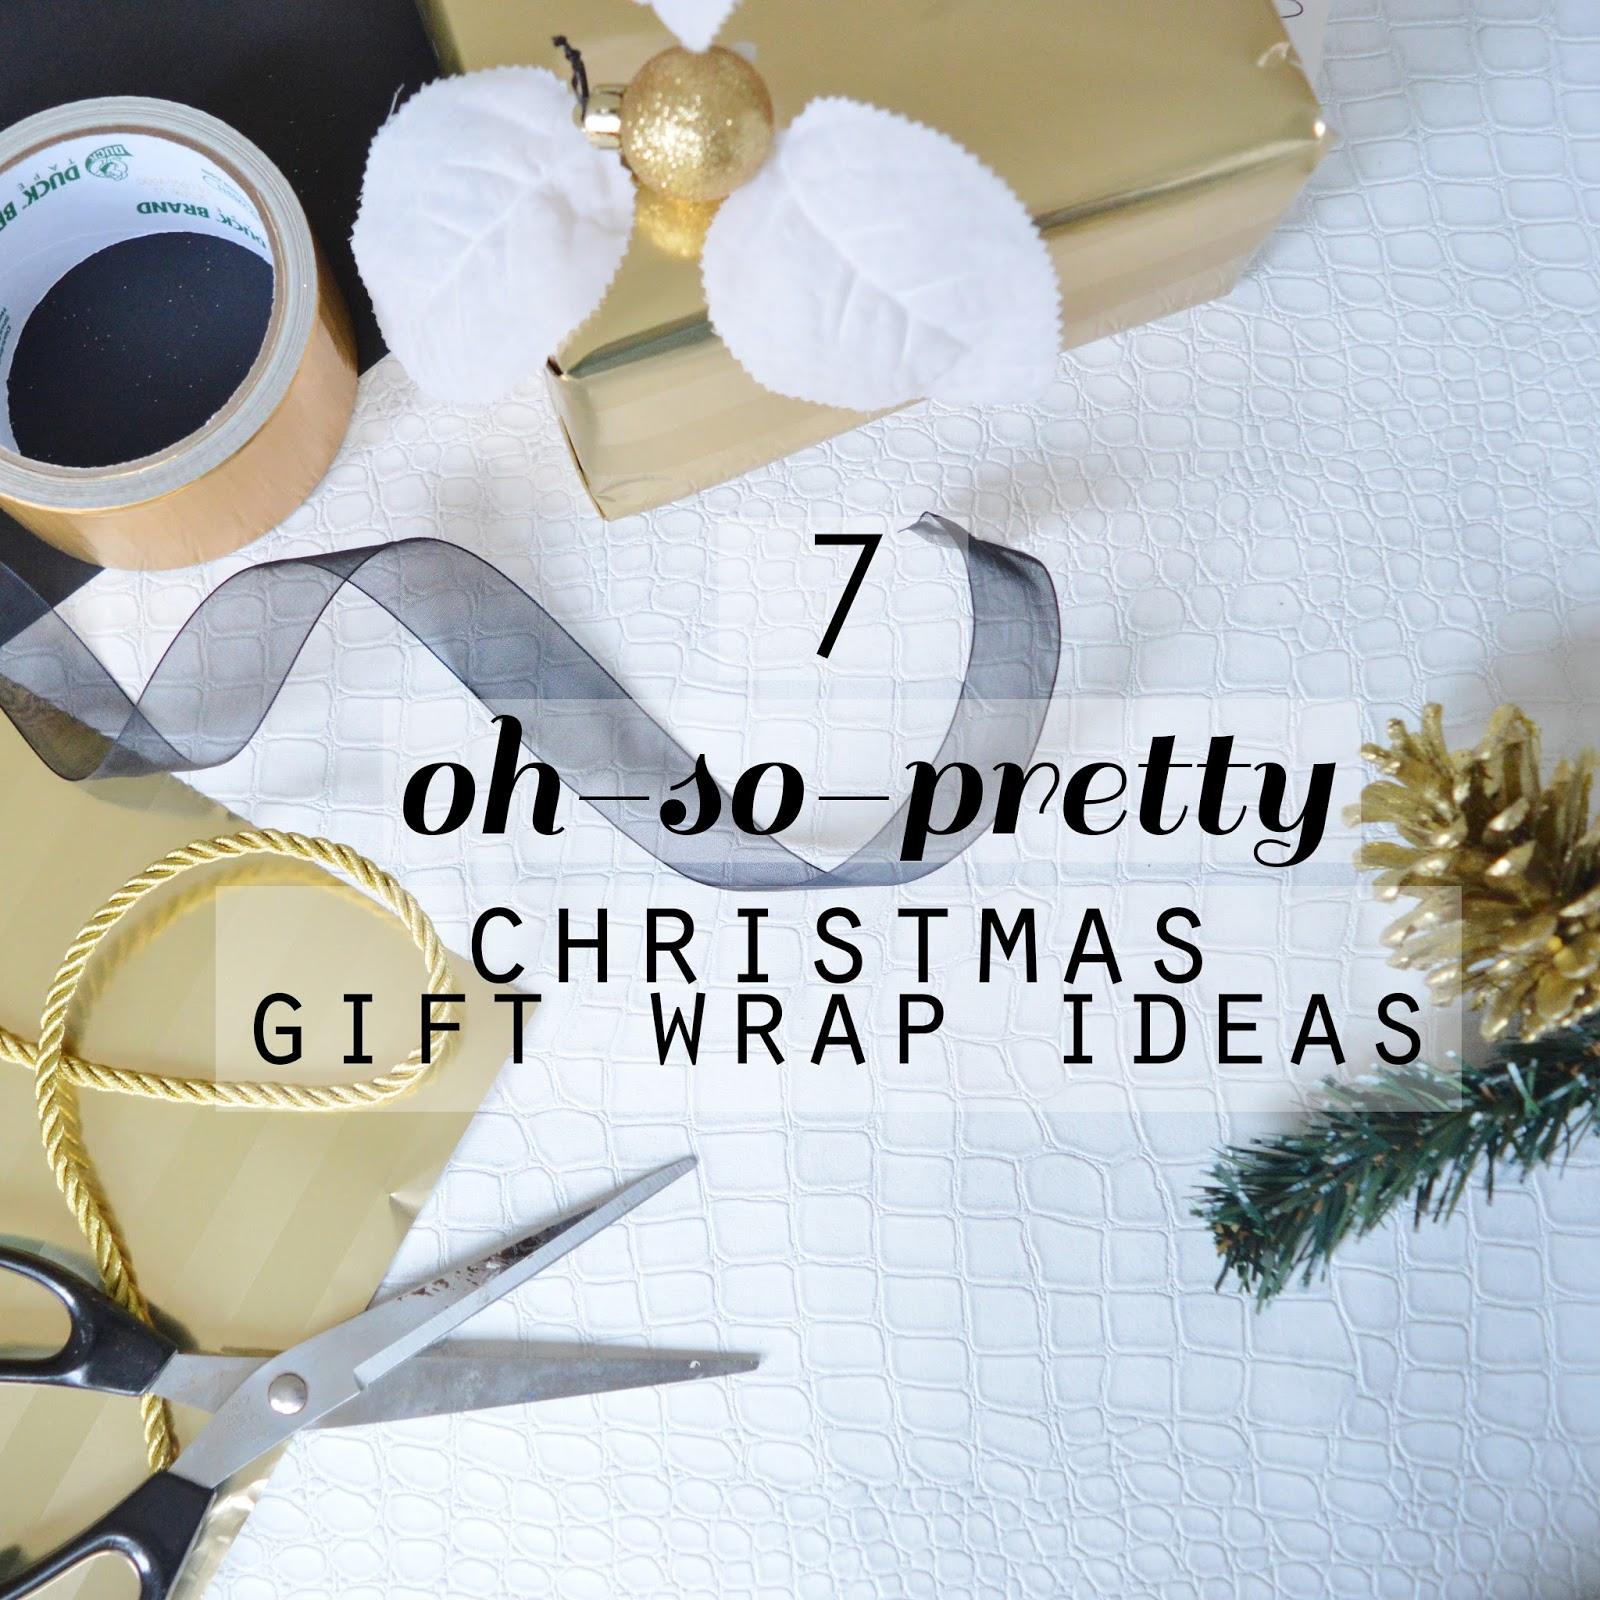 Pinspiration: 7 oh-so-pretty Festive Gift Wrap Ideas